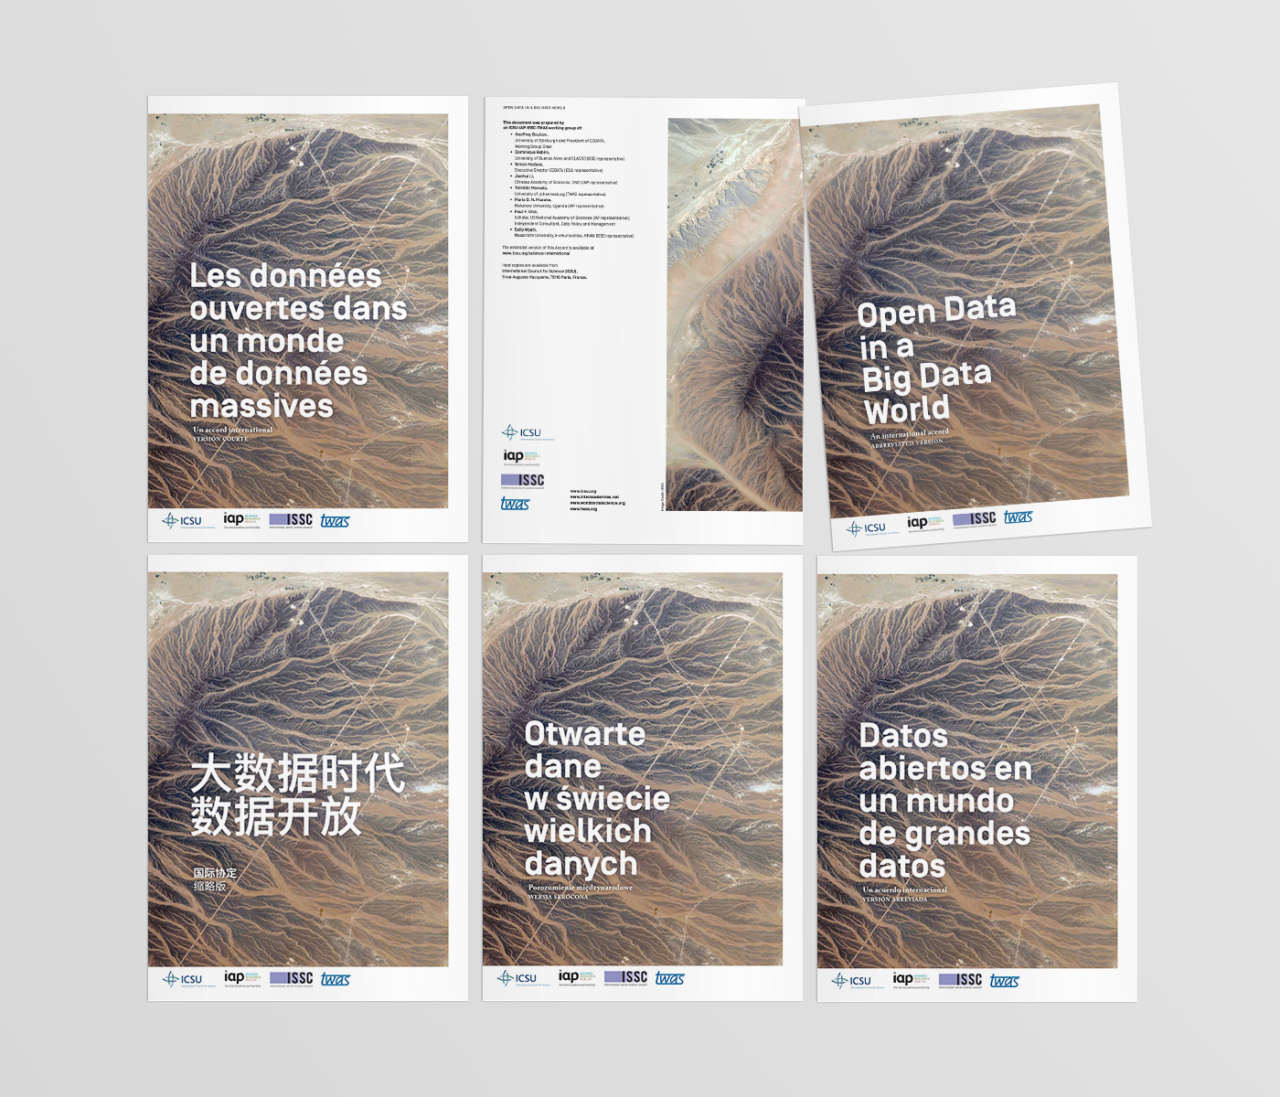 curiekure.de ICSU – Open Data in a Big Data World